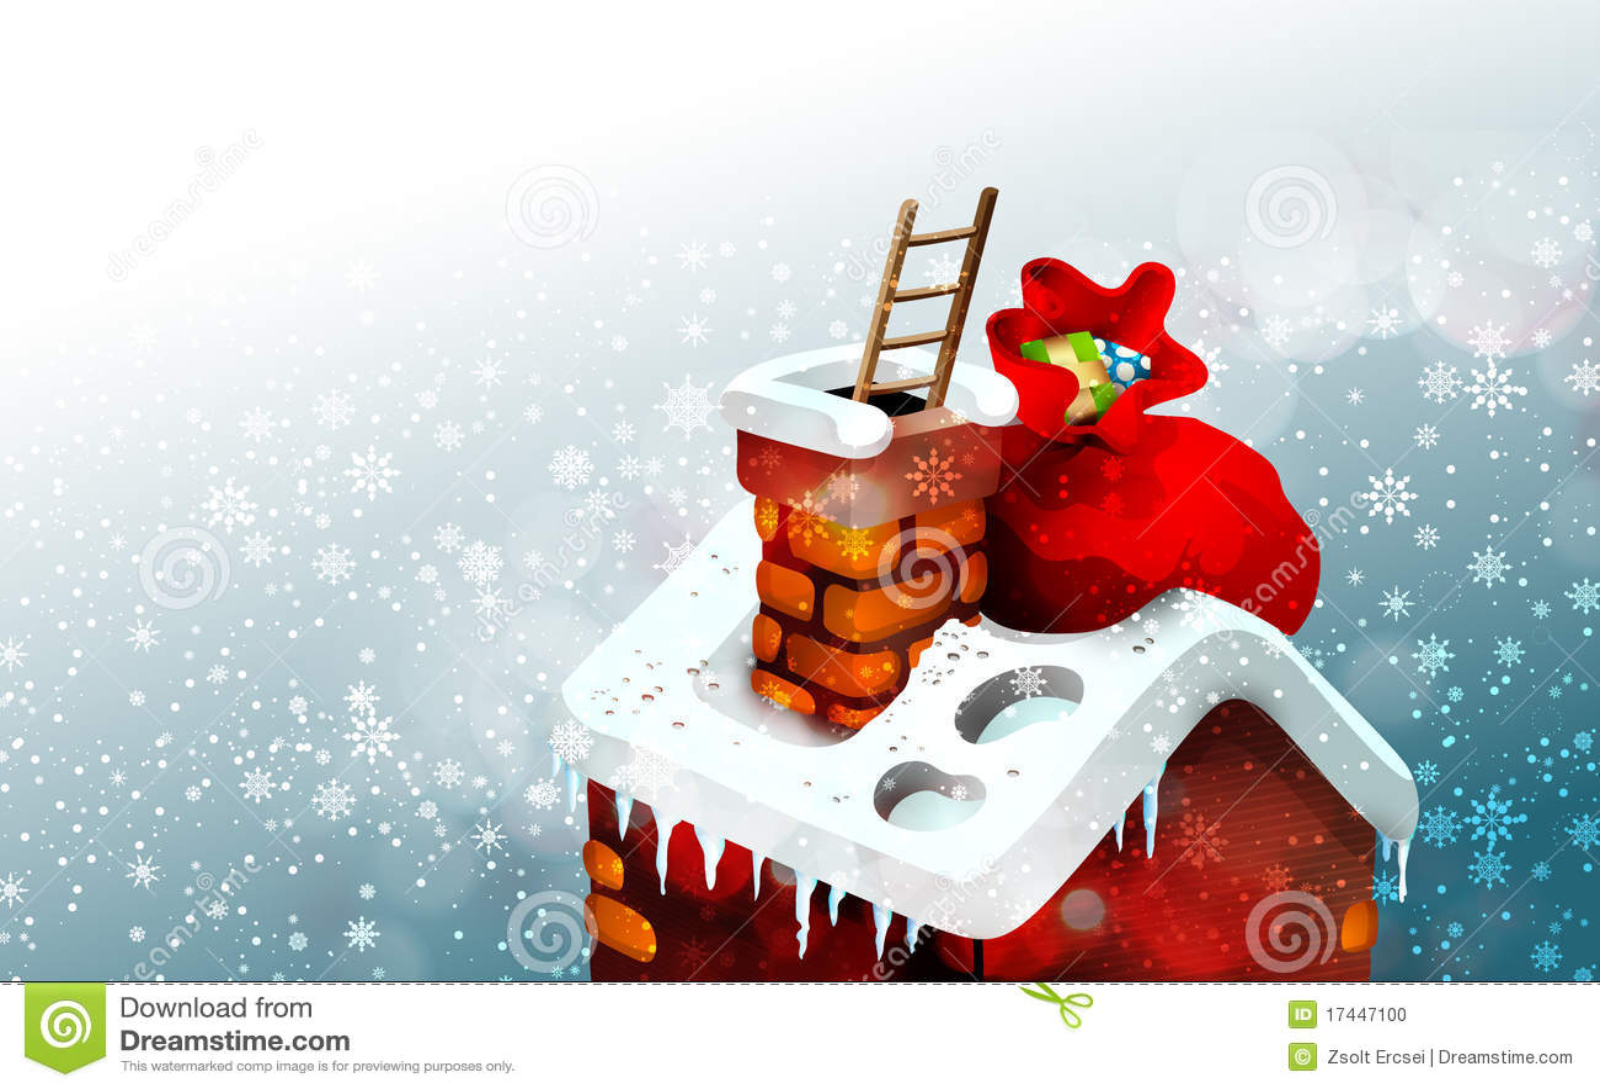 Cute Christmas Scene Illustration Stock Photo Image